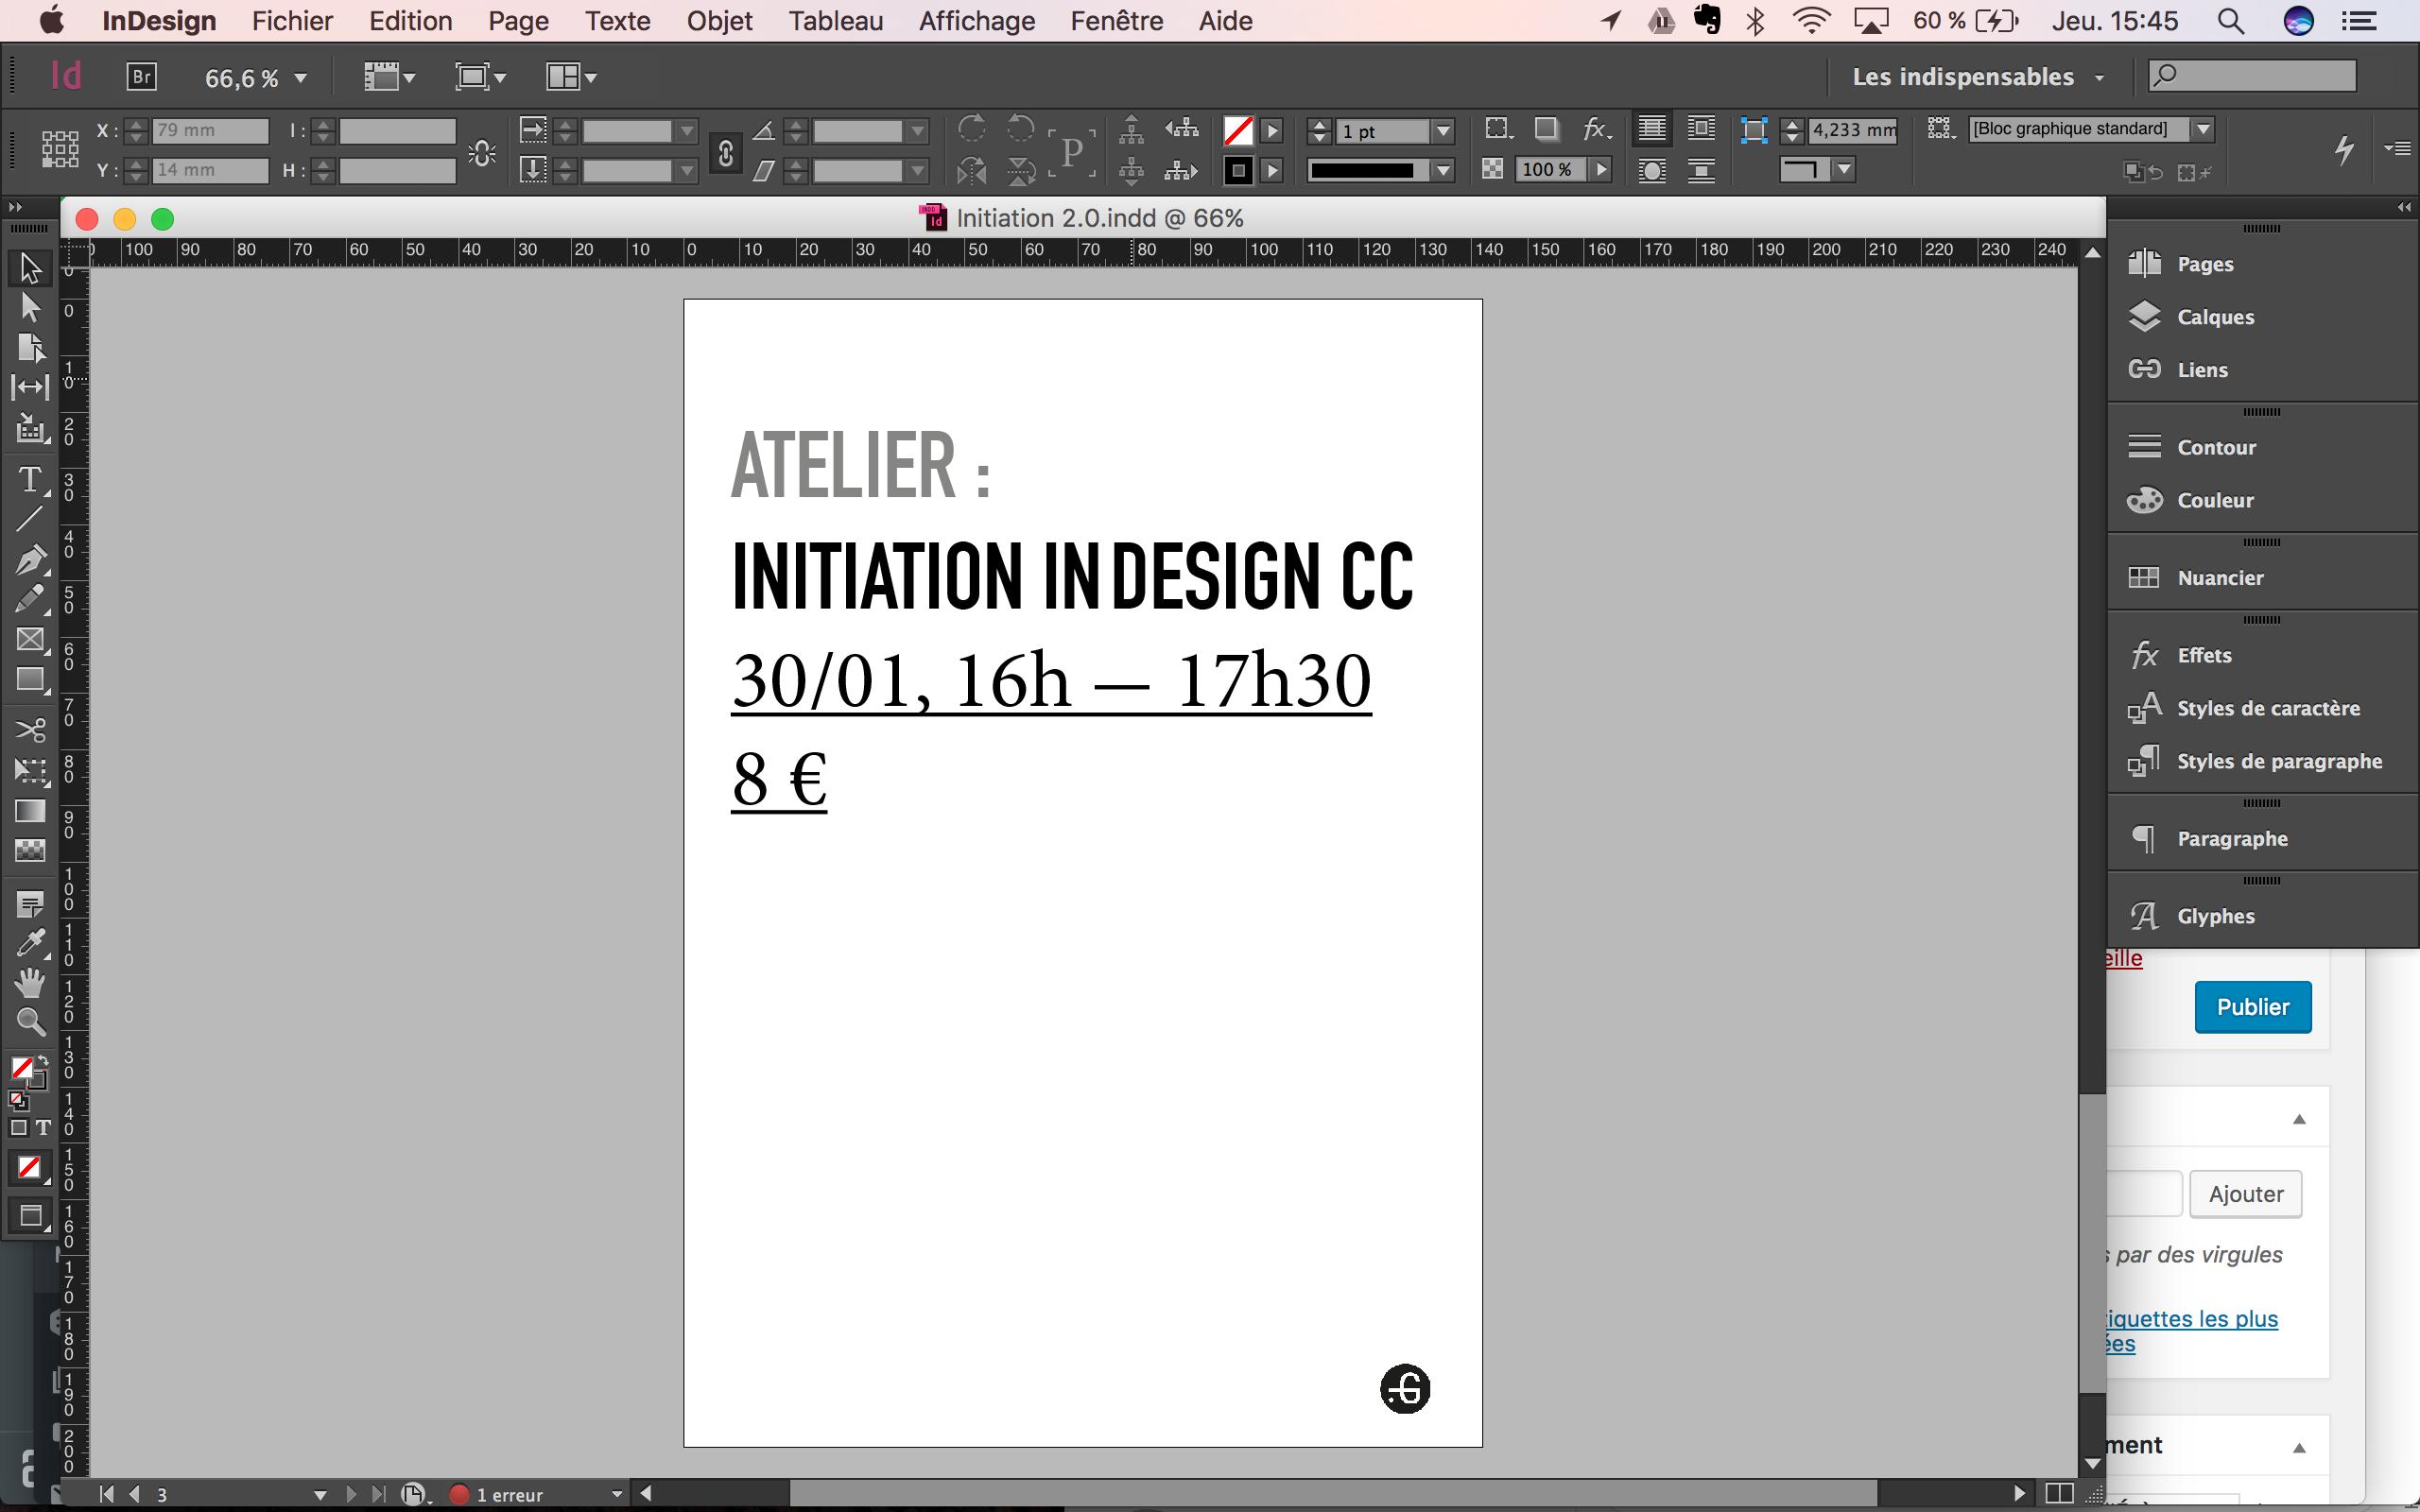 Affiche atelier / initiation au logiciel inDesign CC, Taverne Gutenberg, par Maïa d'Aboville